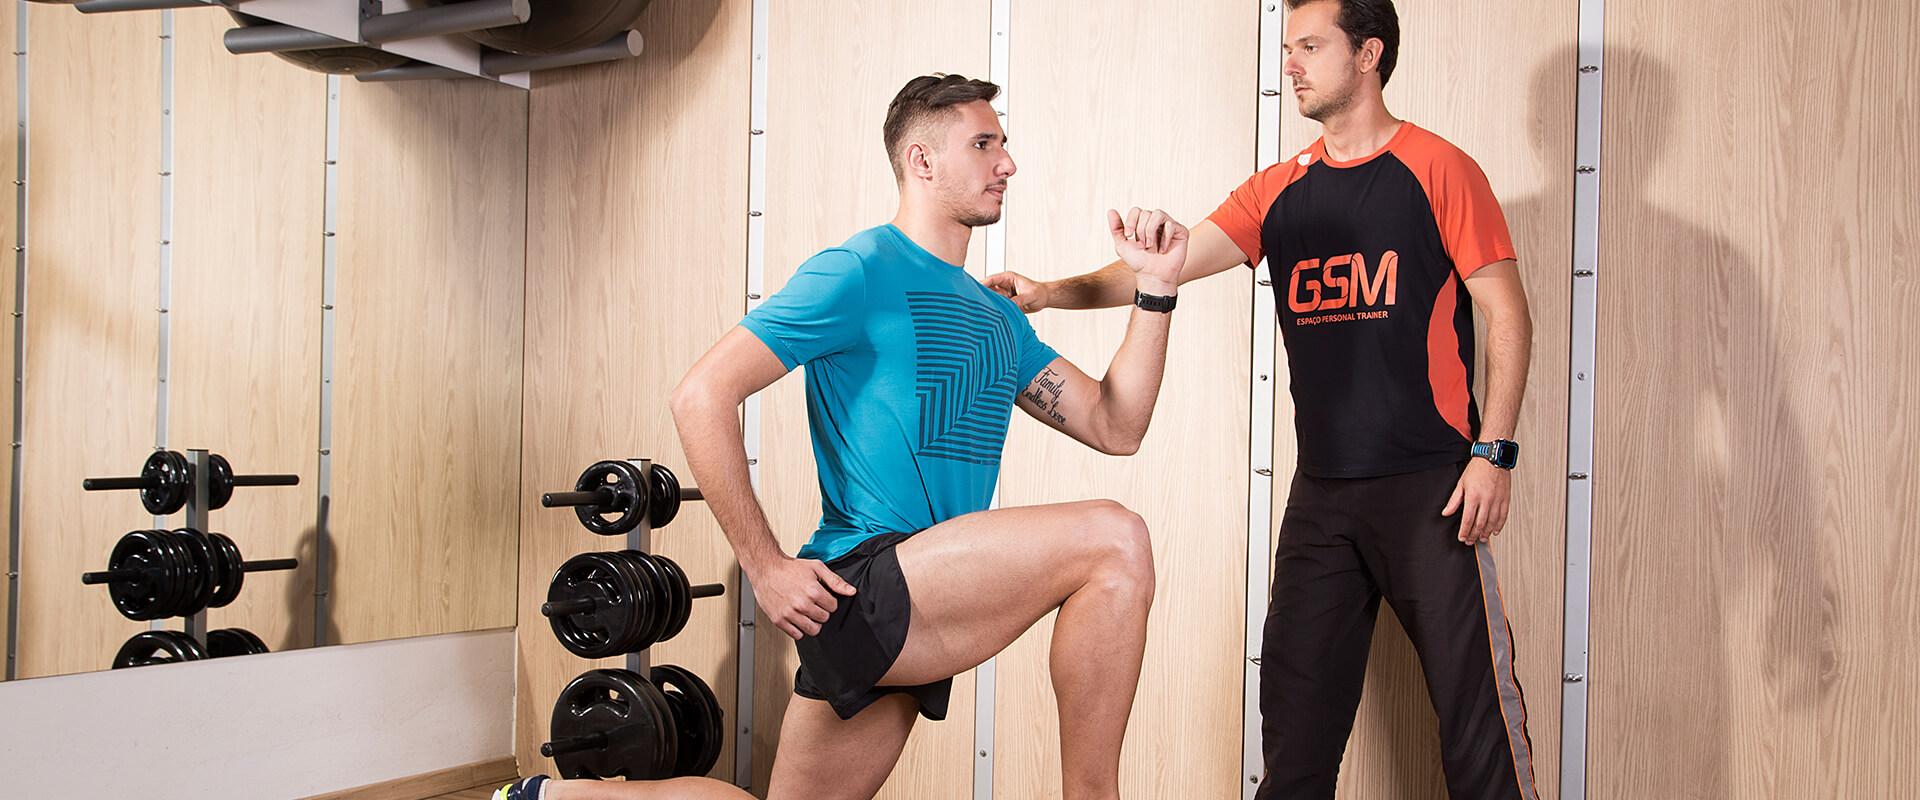 espaco-gsm-personal-trainer-004